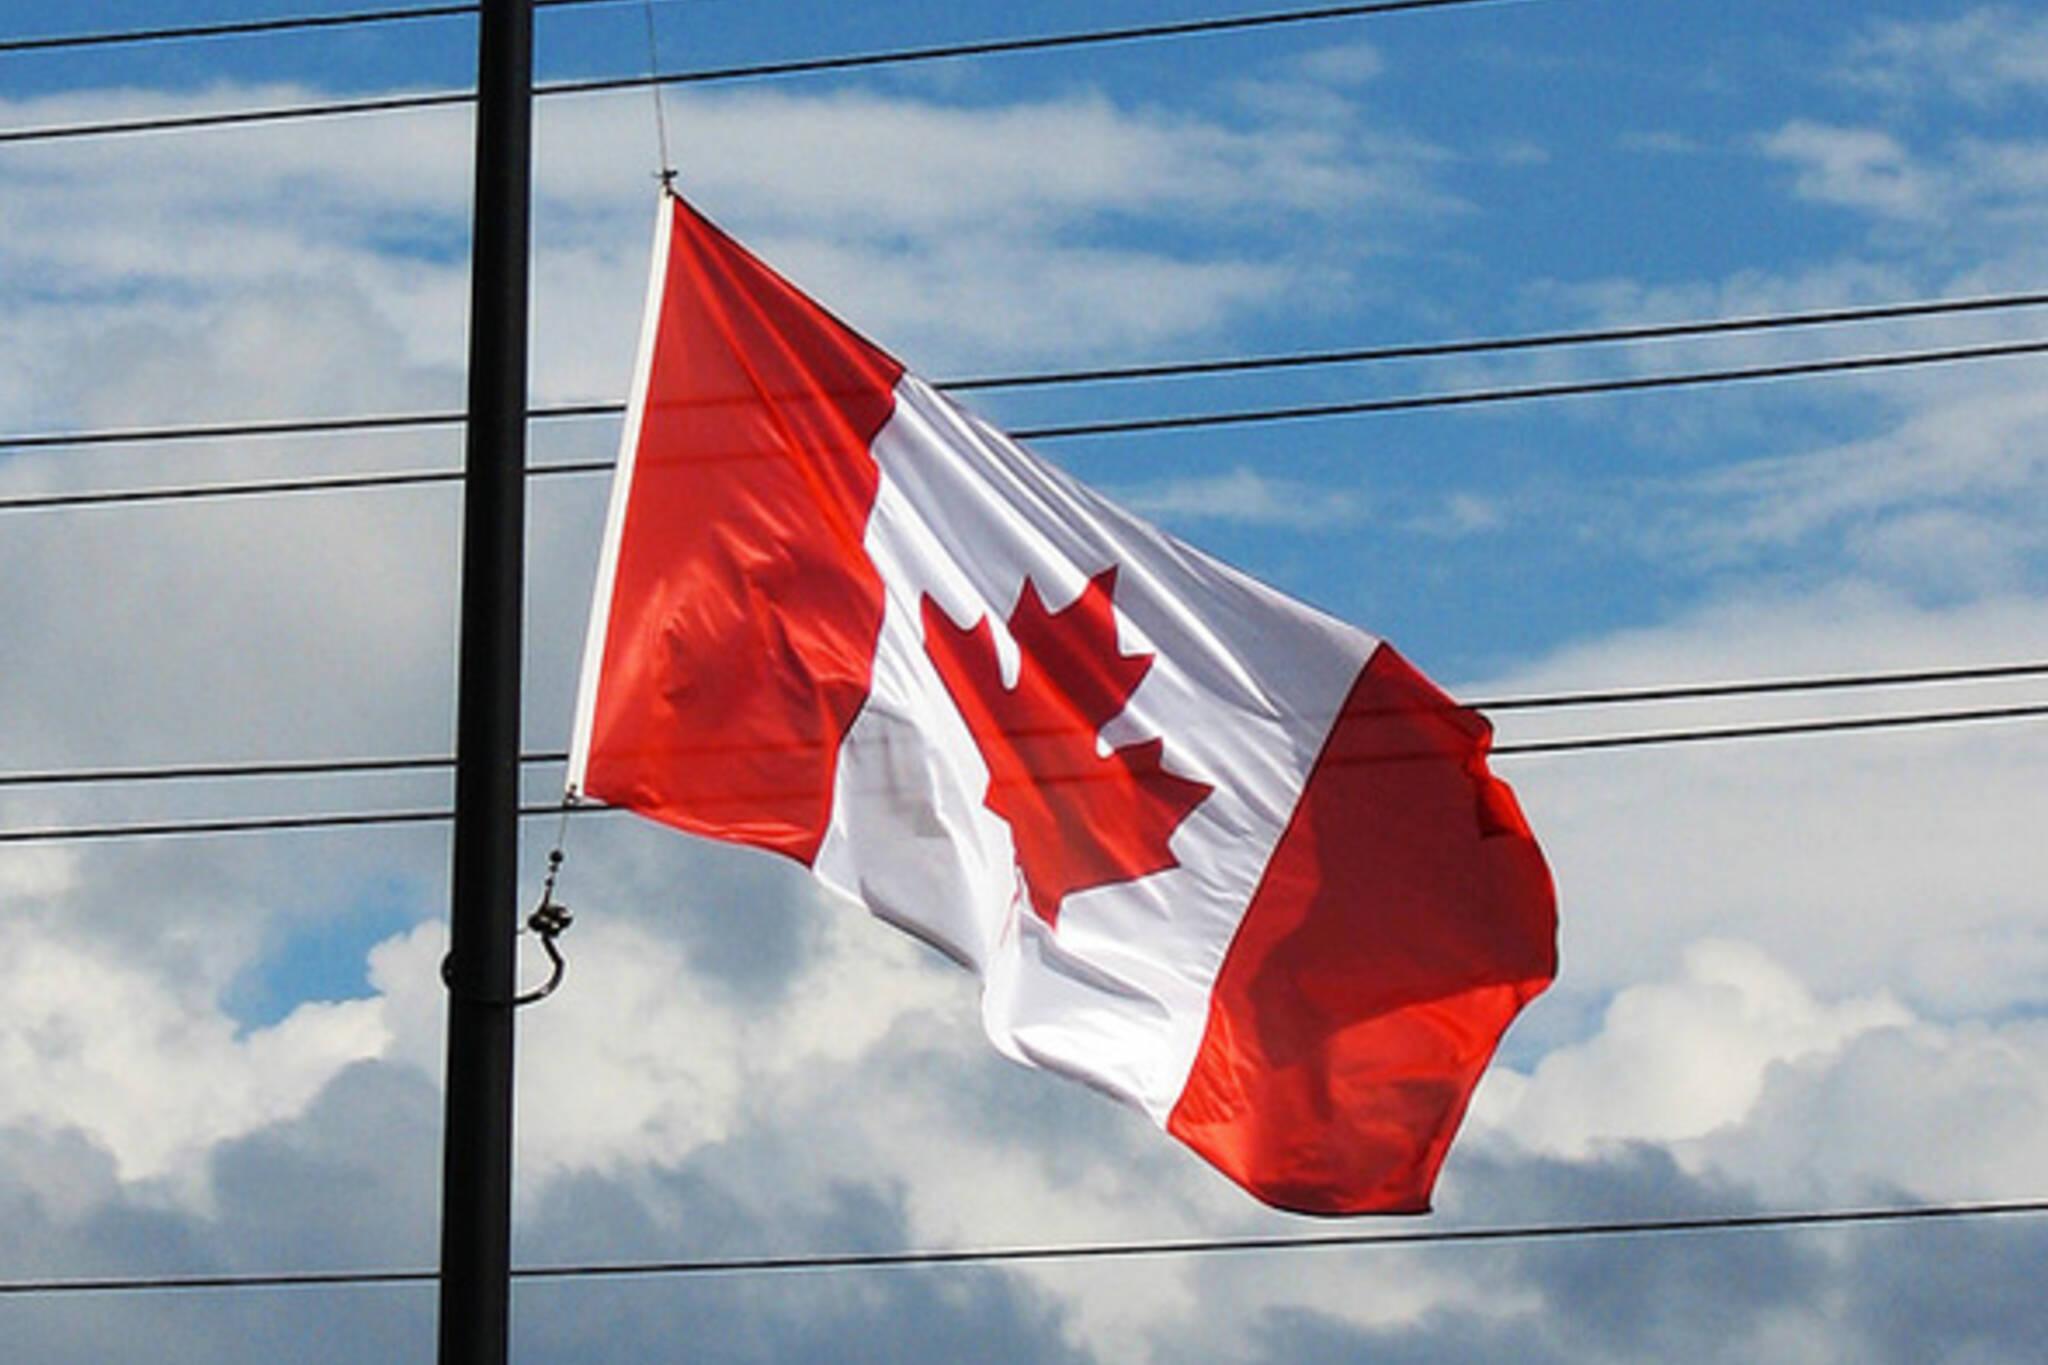 Canada Day Toronto 2011